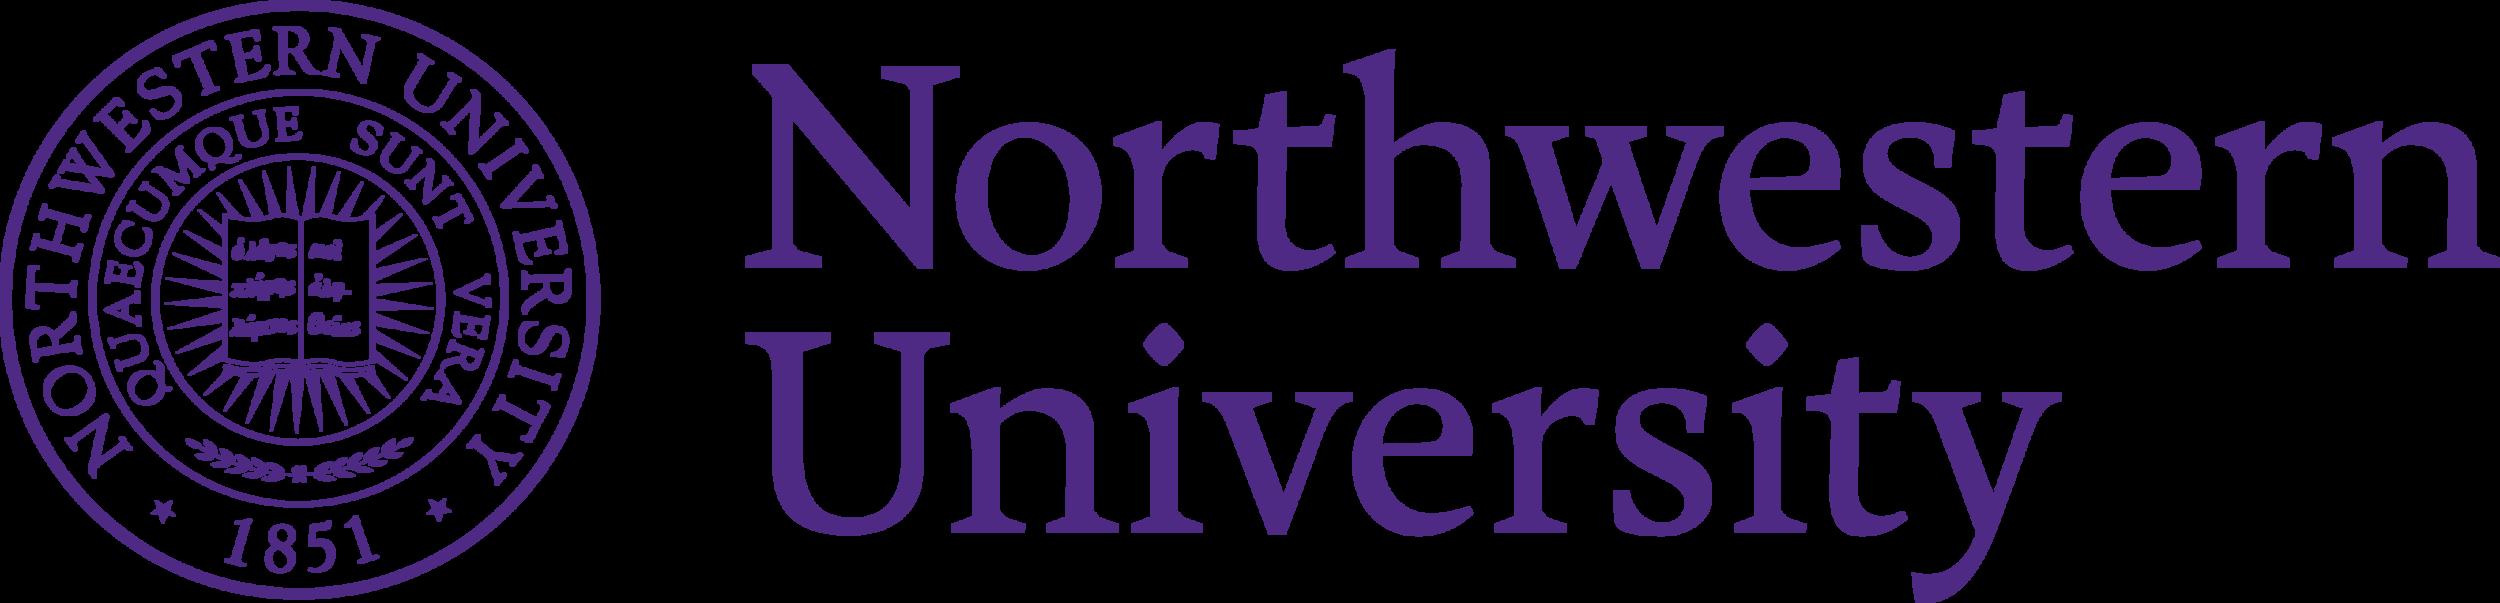 Northwestern Formal_horizontal.png